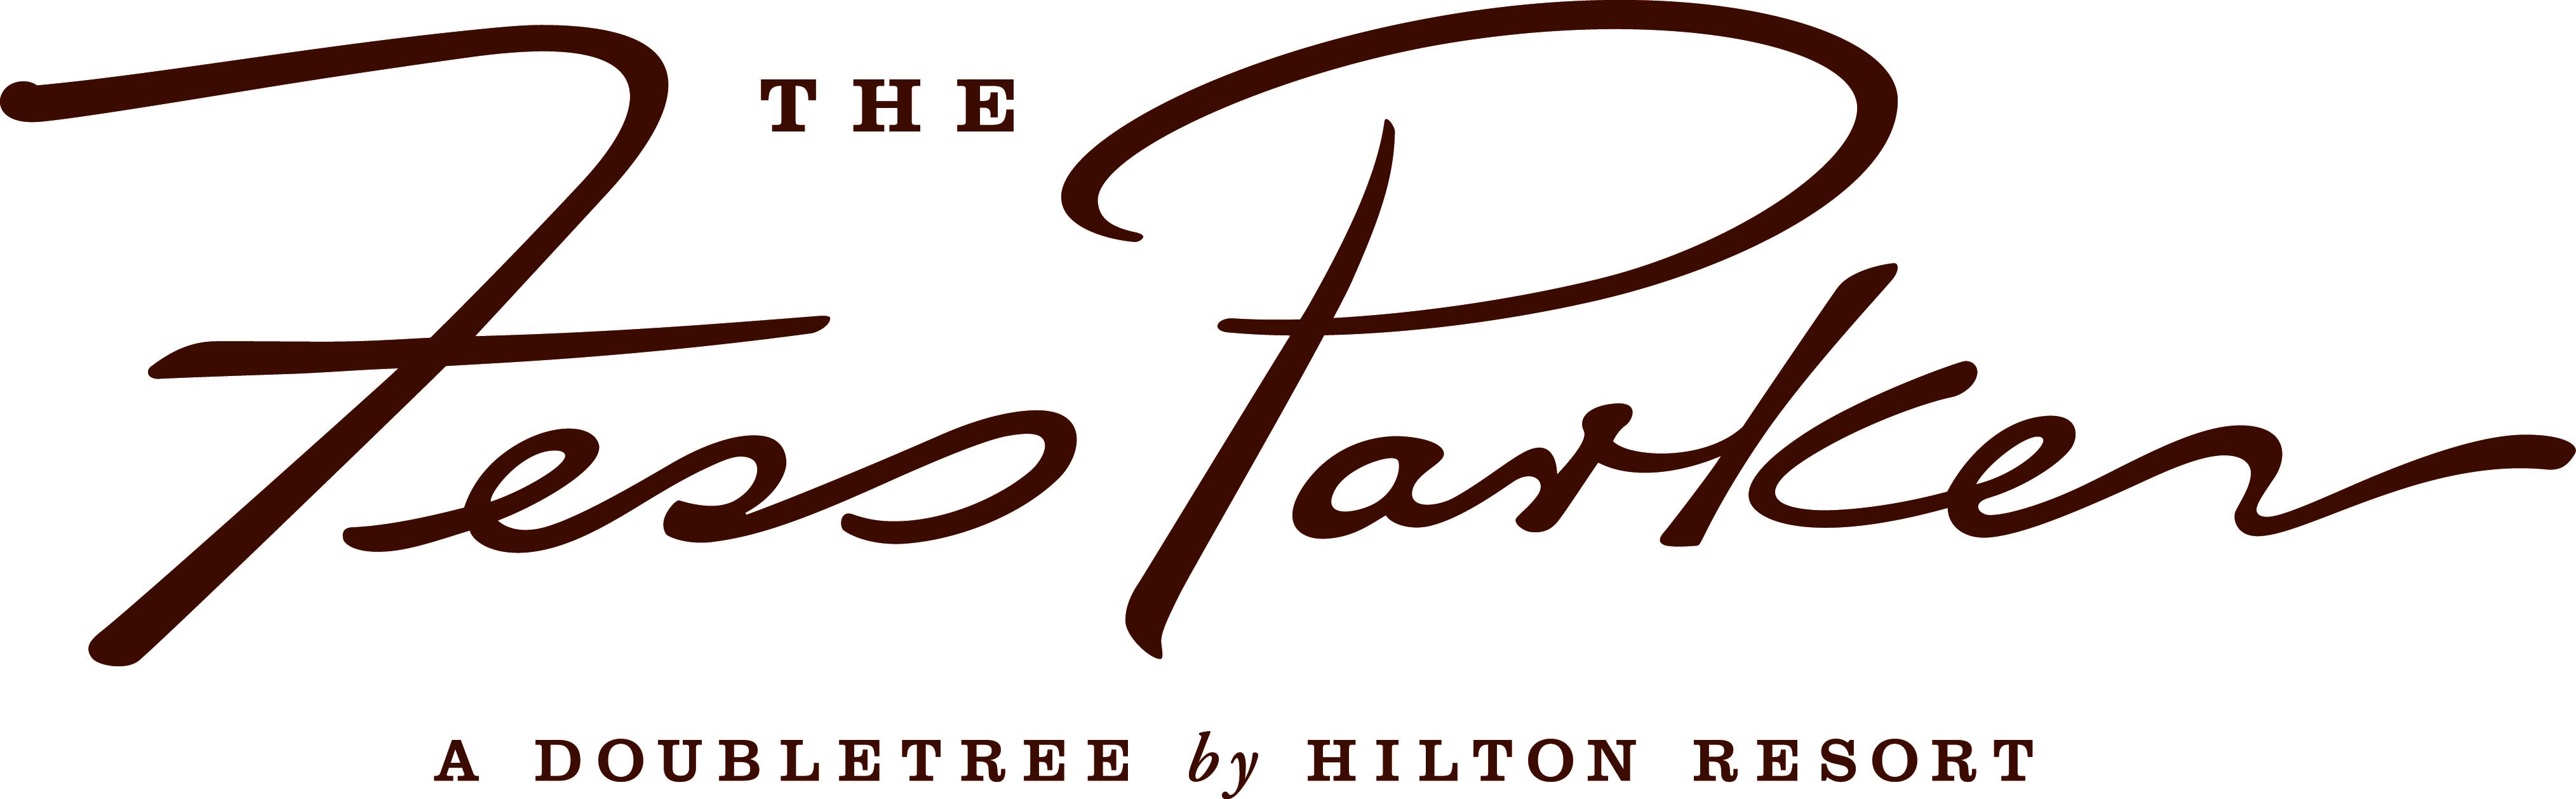 FessParker_ByHilton_Logo_P4695